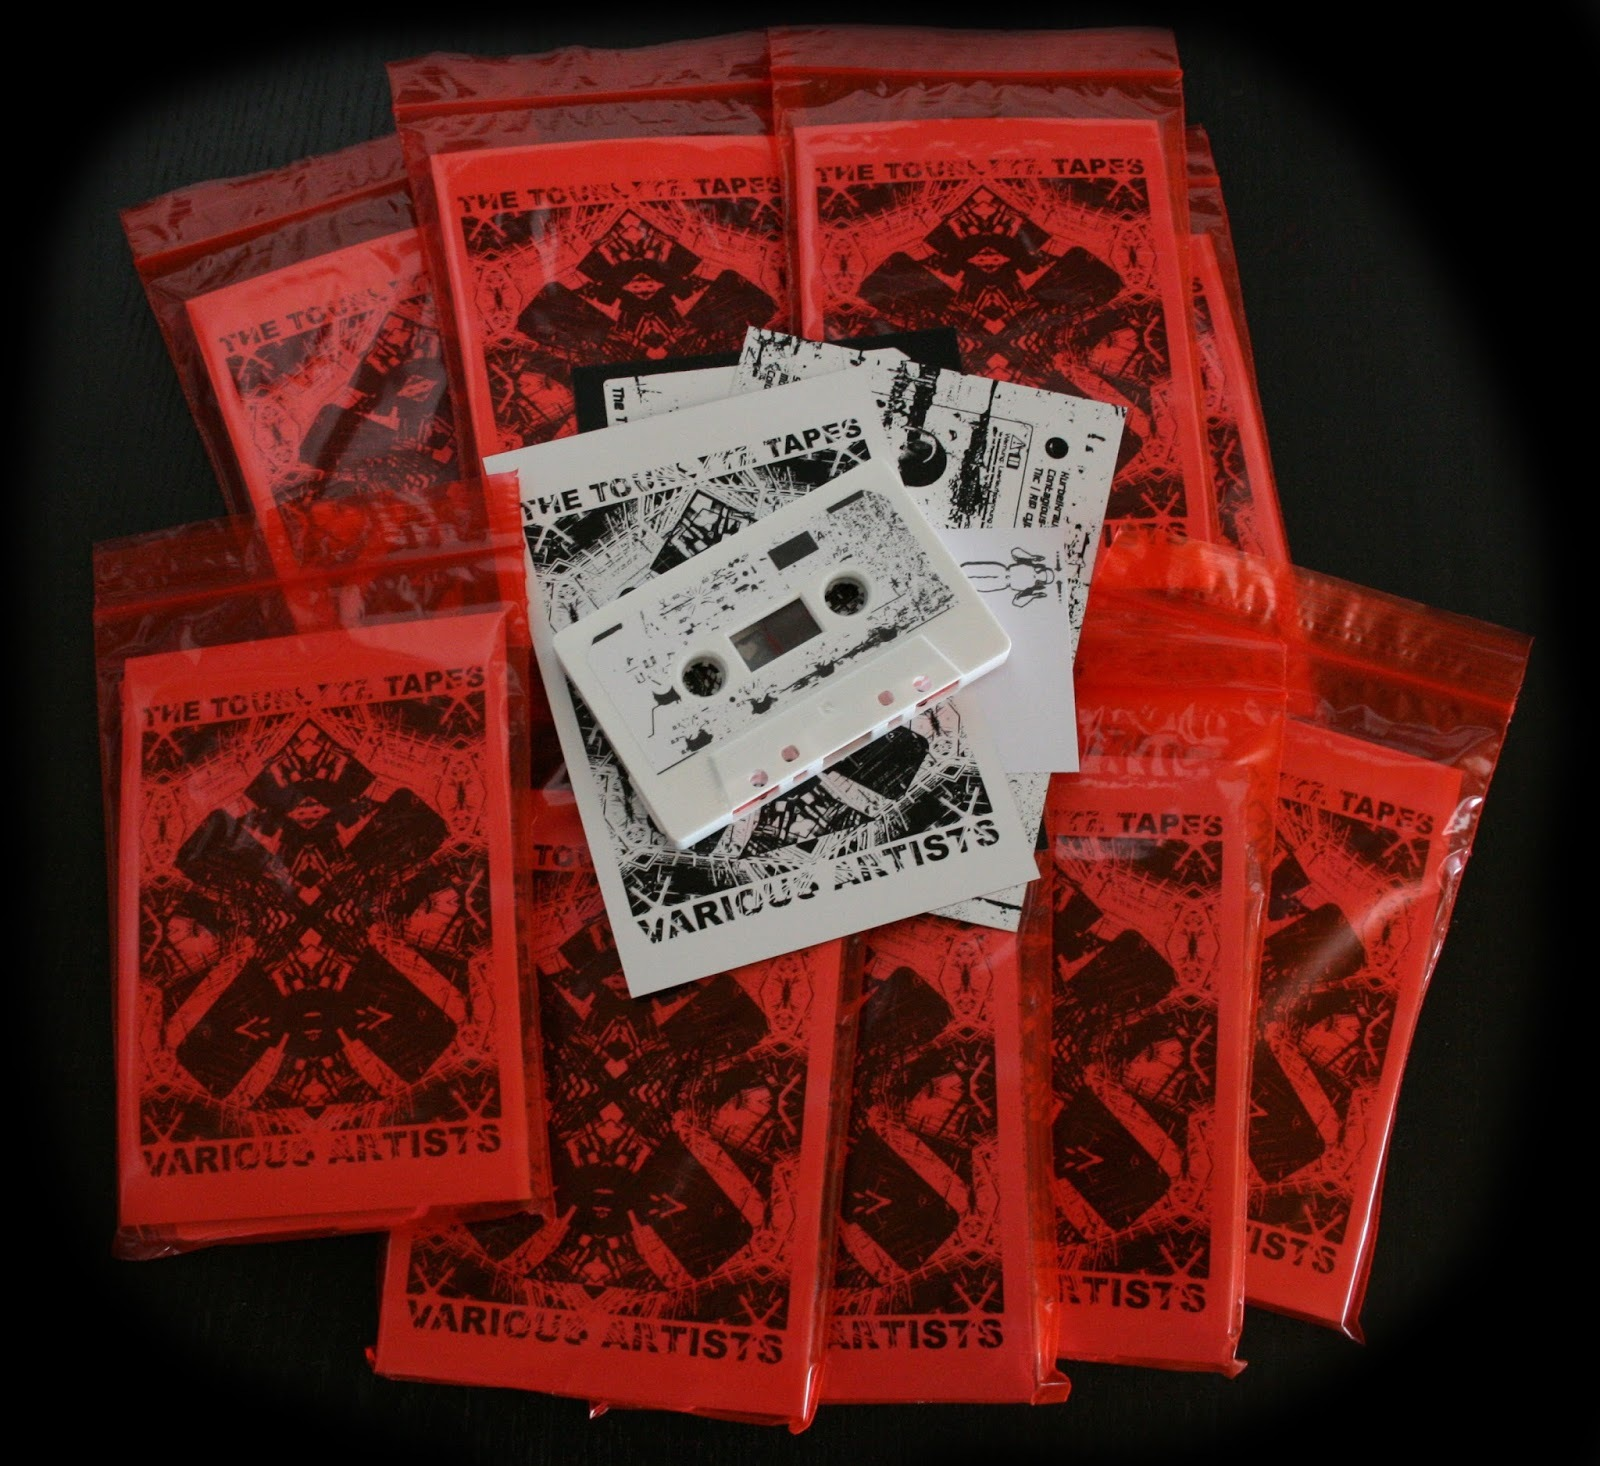 V/A - The Tourette Tapes  cassette - 画像1